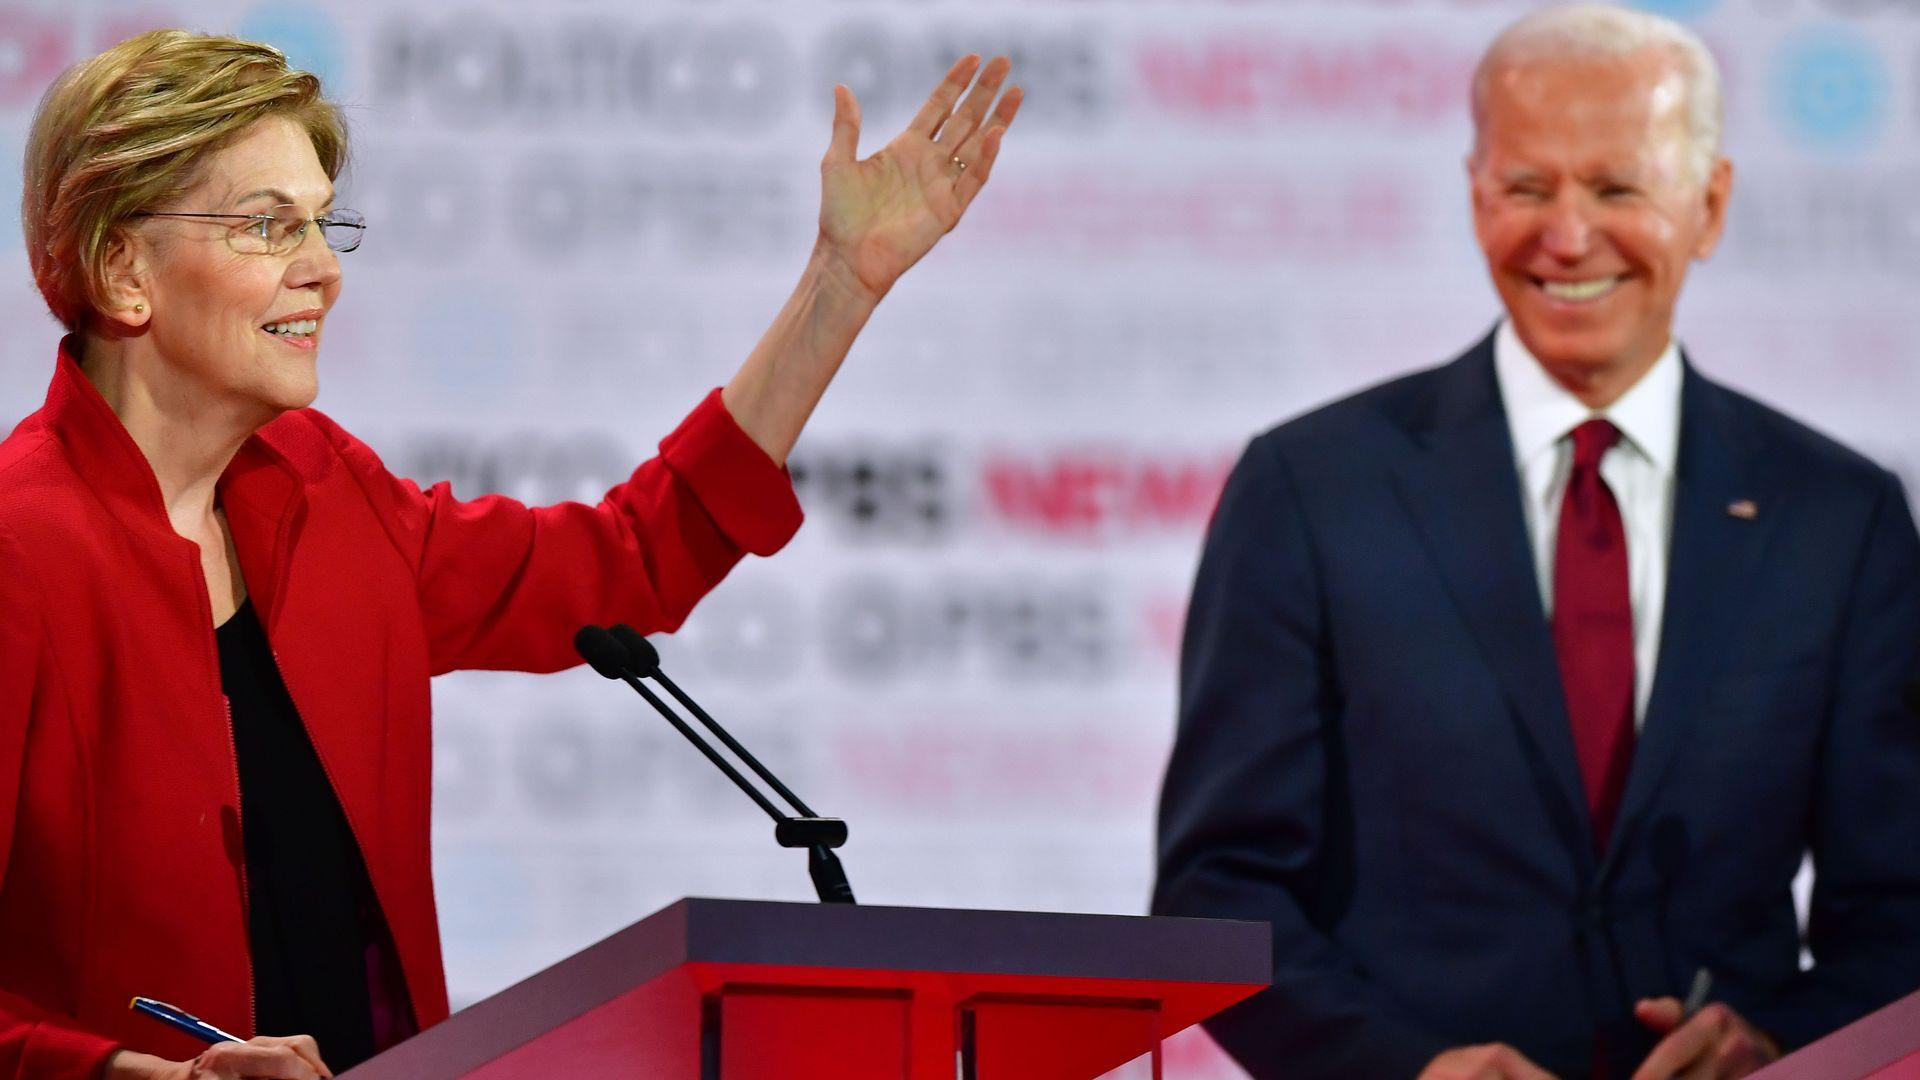 In this image, Elizabeth Warren and Joe Biden stand on stage